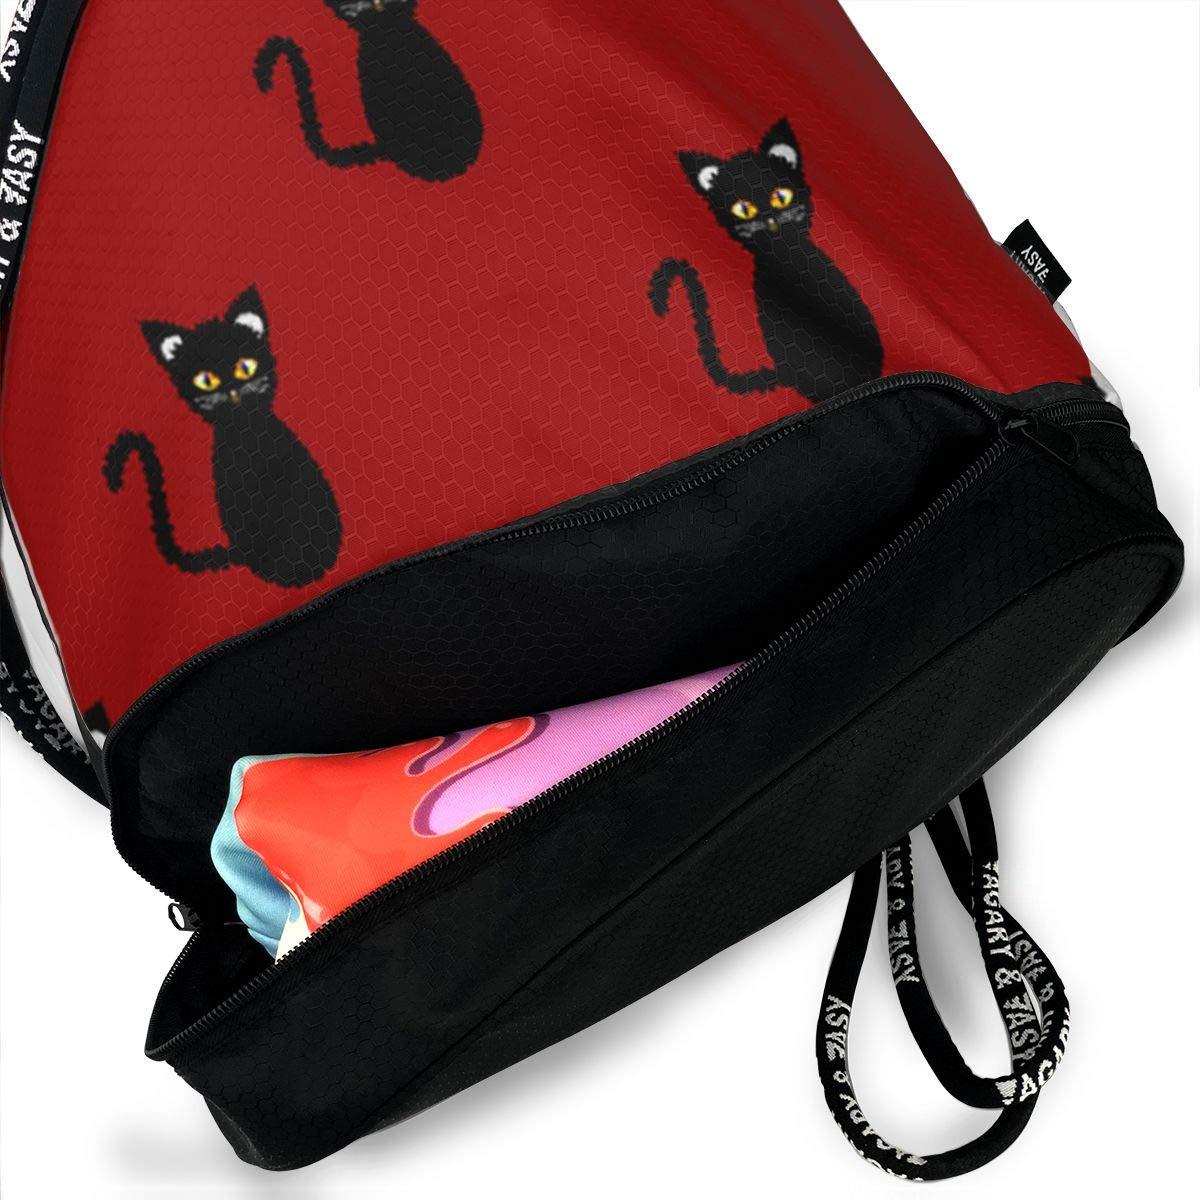 f056befd1dea Amazon.com: HUOPR5Q Black-cat Drawstring Backpack Sport Gym Sack ...